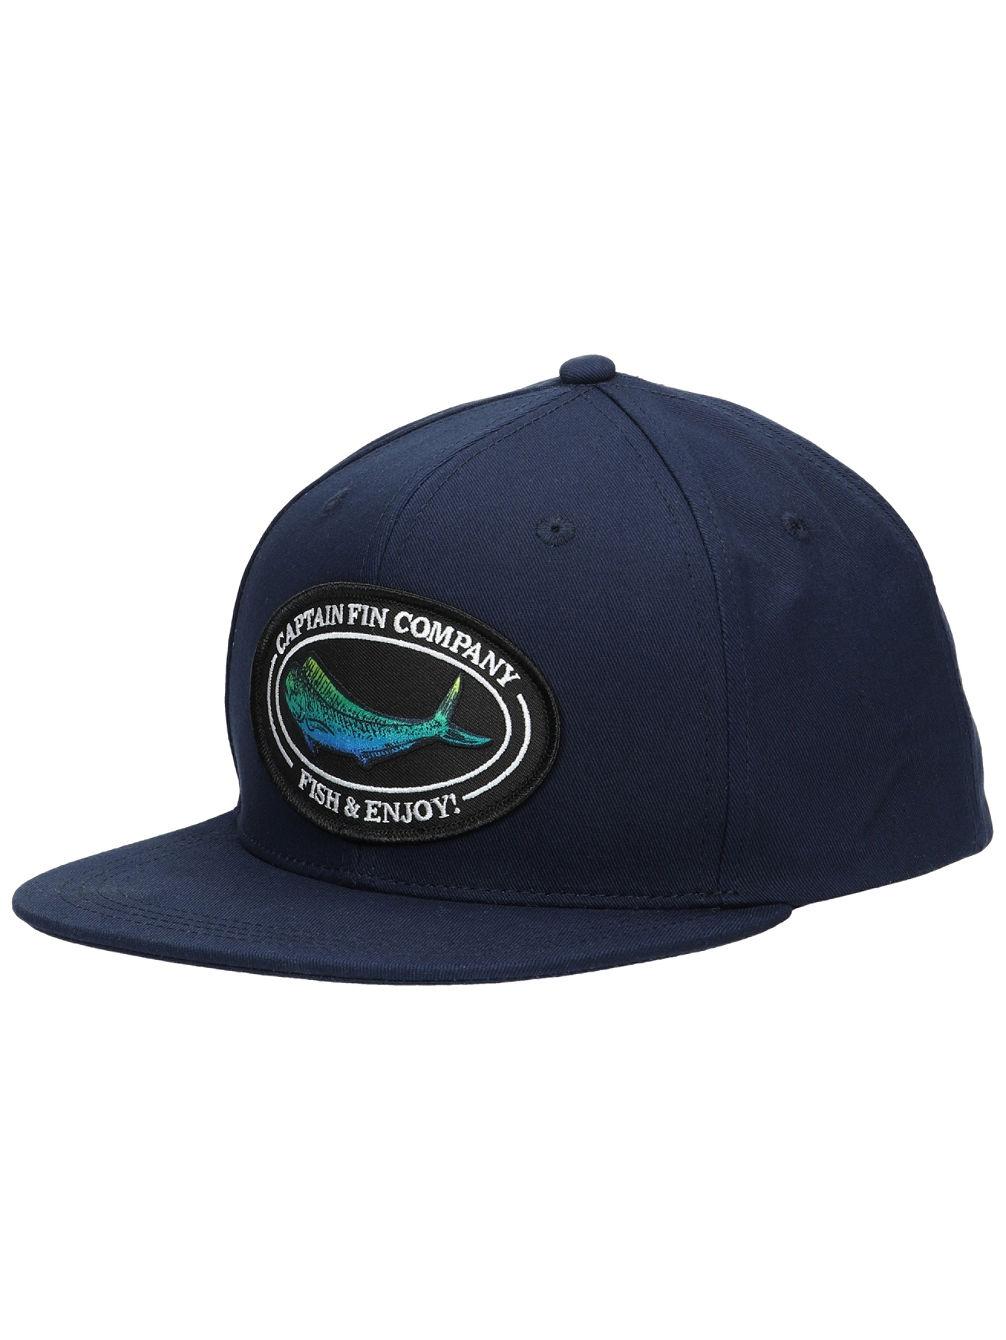 Captain Fin Mahi Mahi Hut Cap online kaufen bei blue-tomato.com